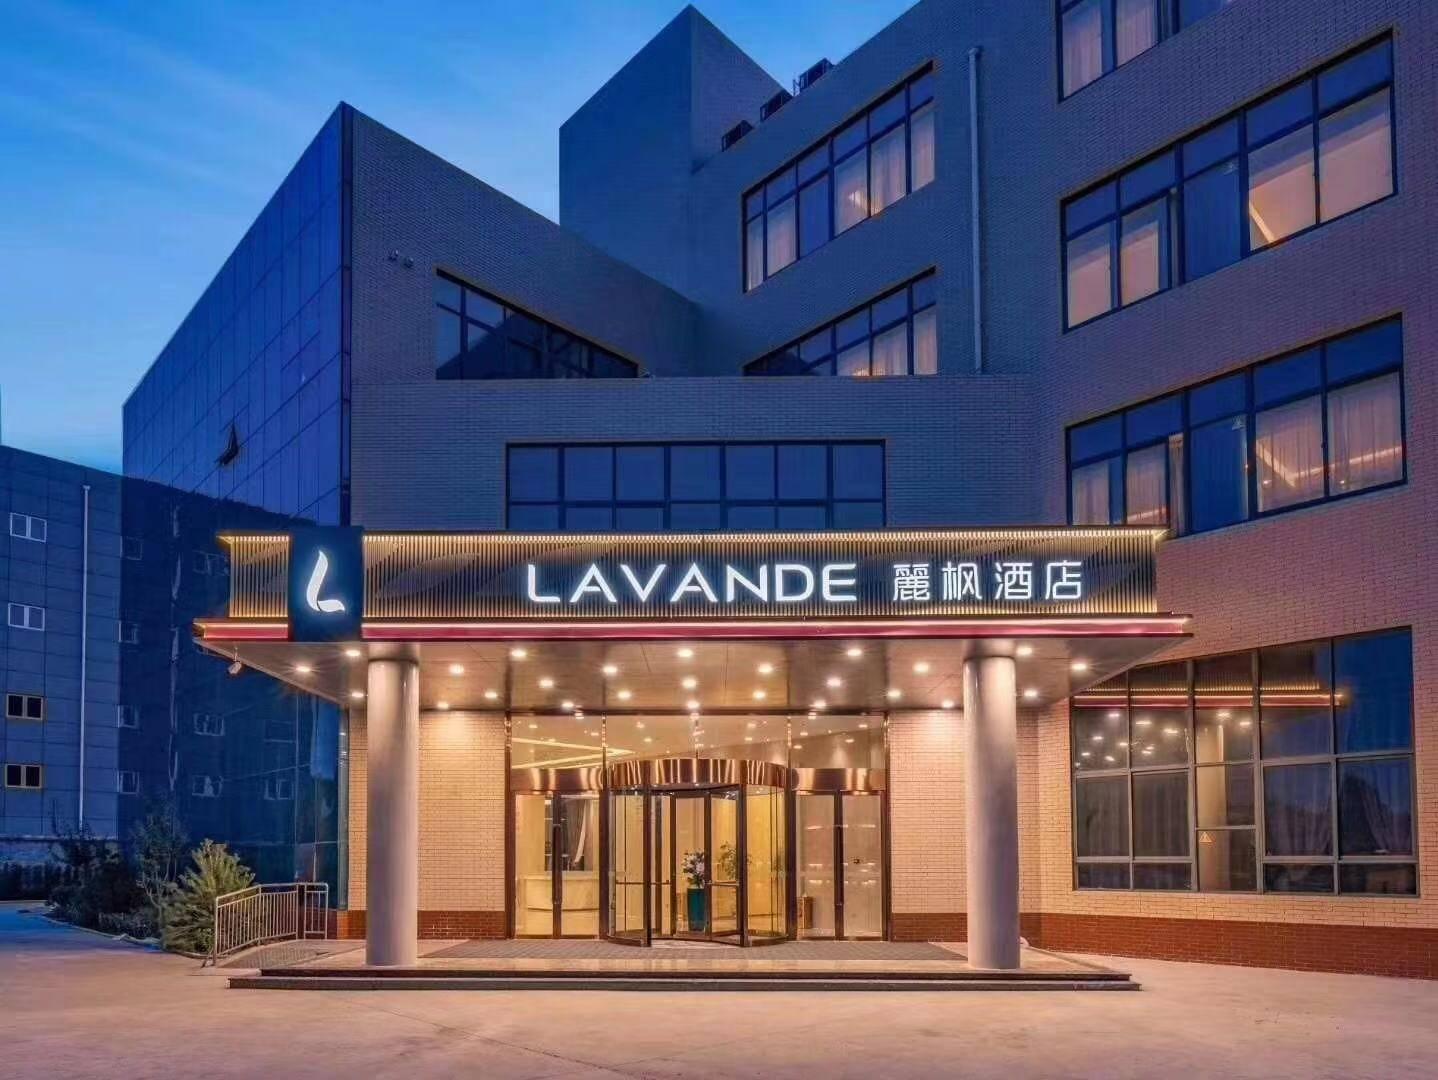 Lavande Hotels� Jinan Yaoqiang International Airport Store